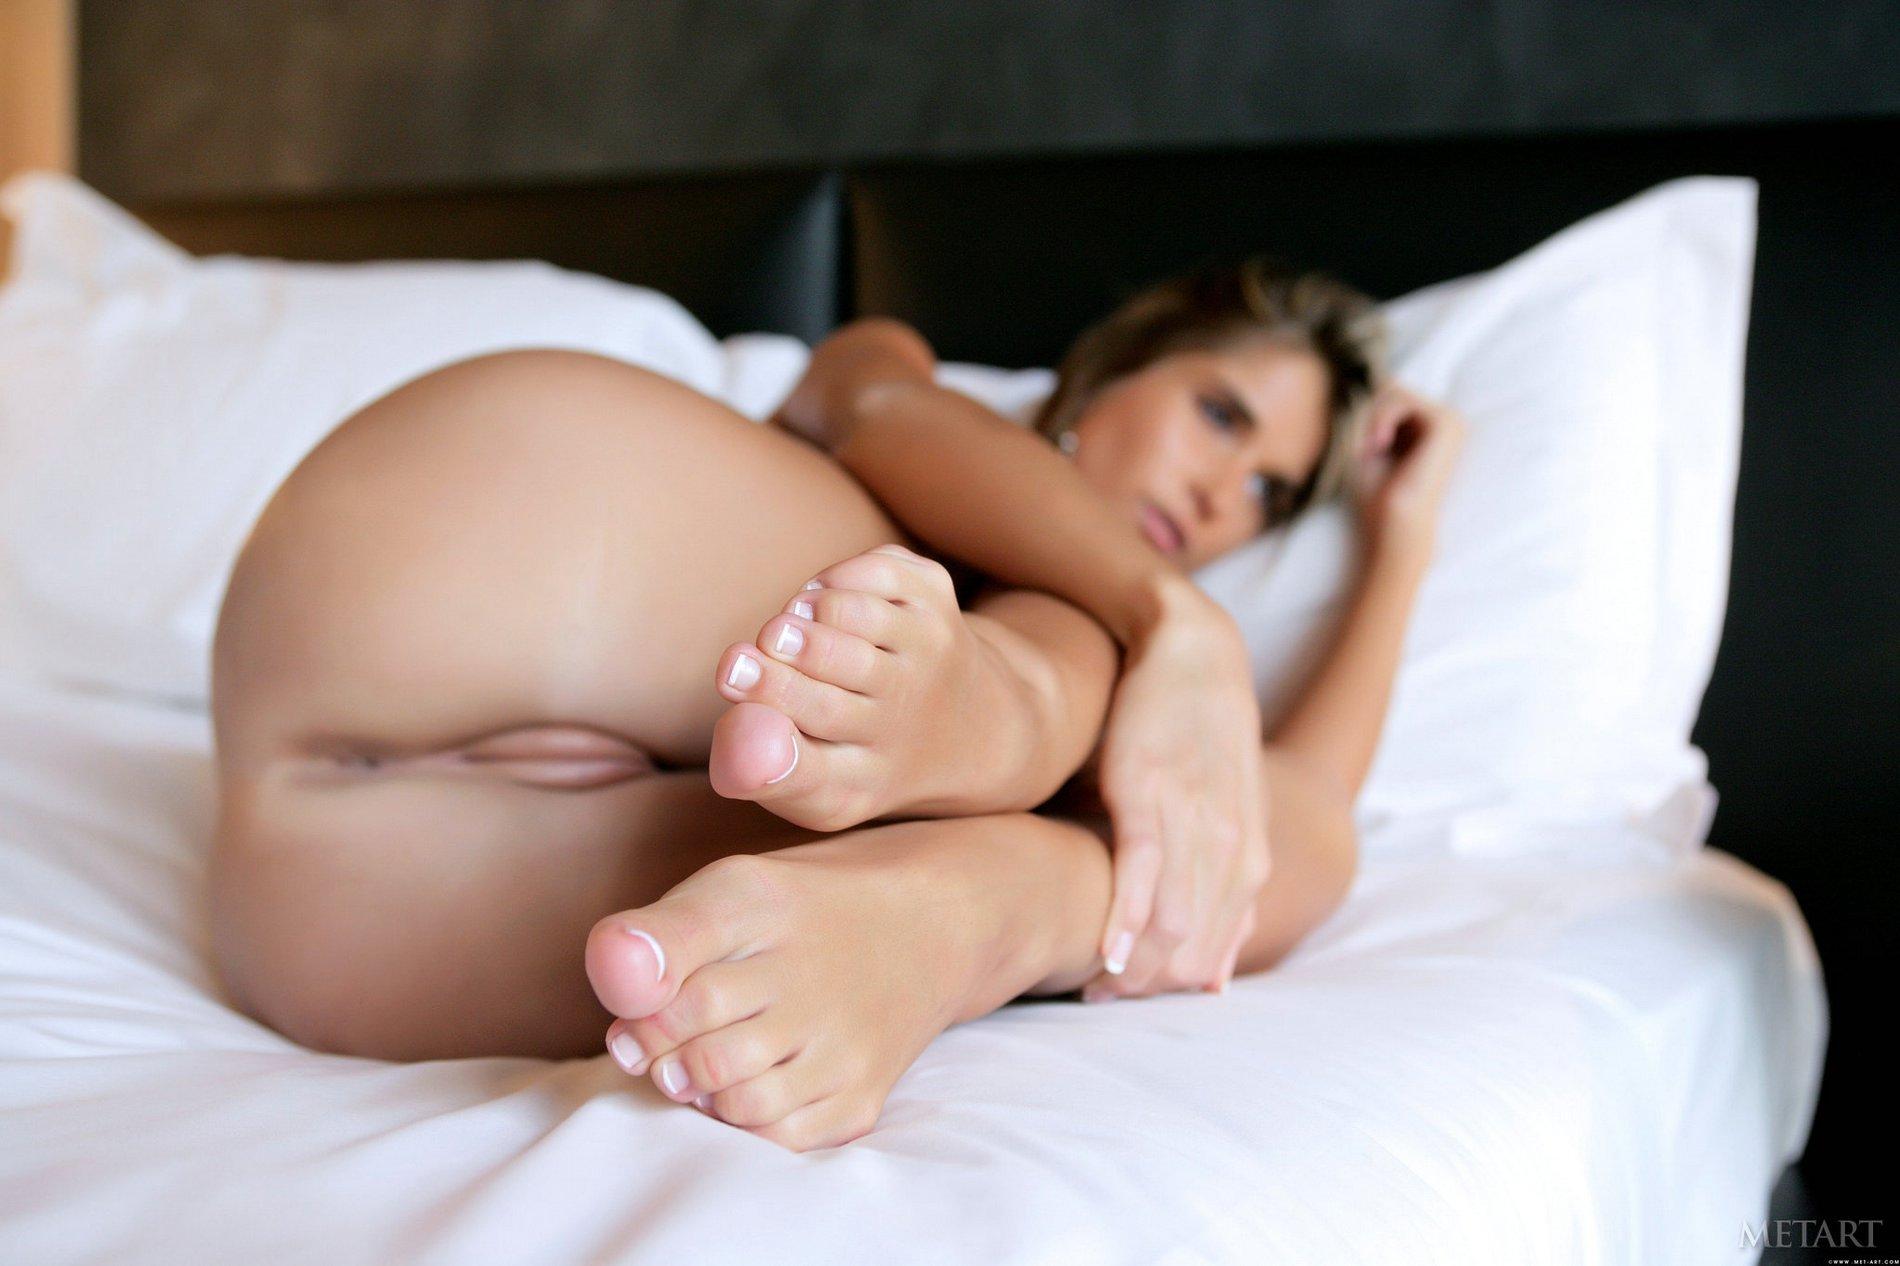 Hairy Brunette Nessa Devil With Nice Feet Wearing Black Stockings Enjoying Groupsex